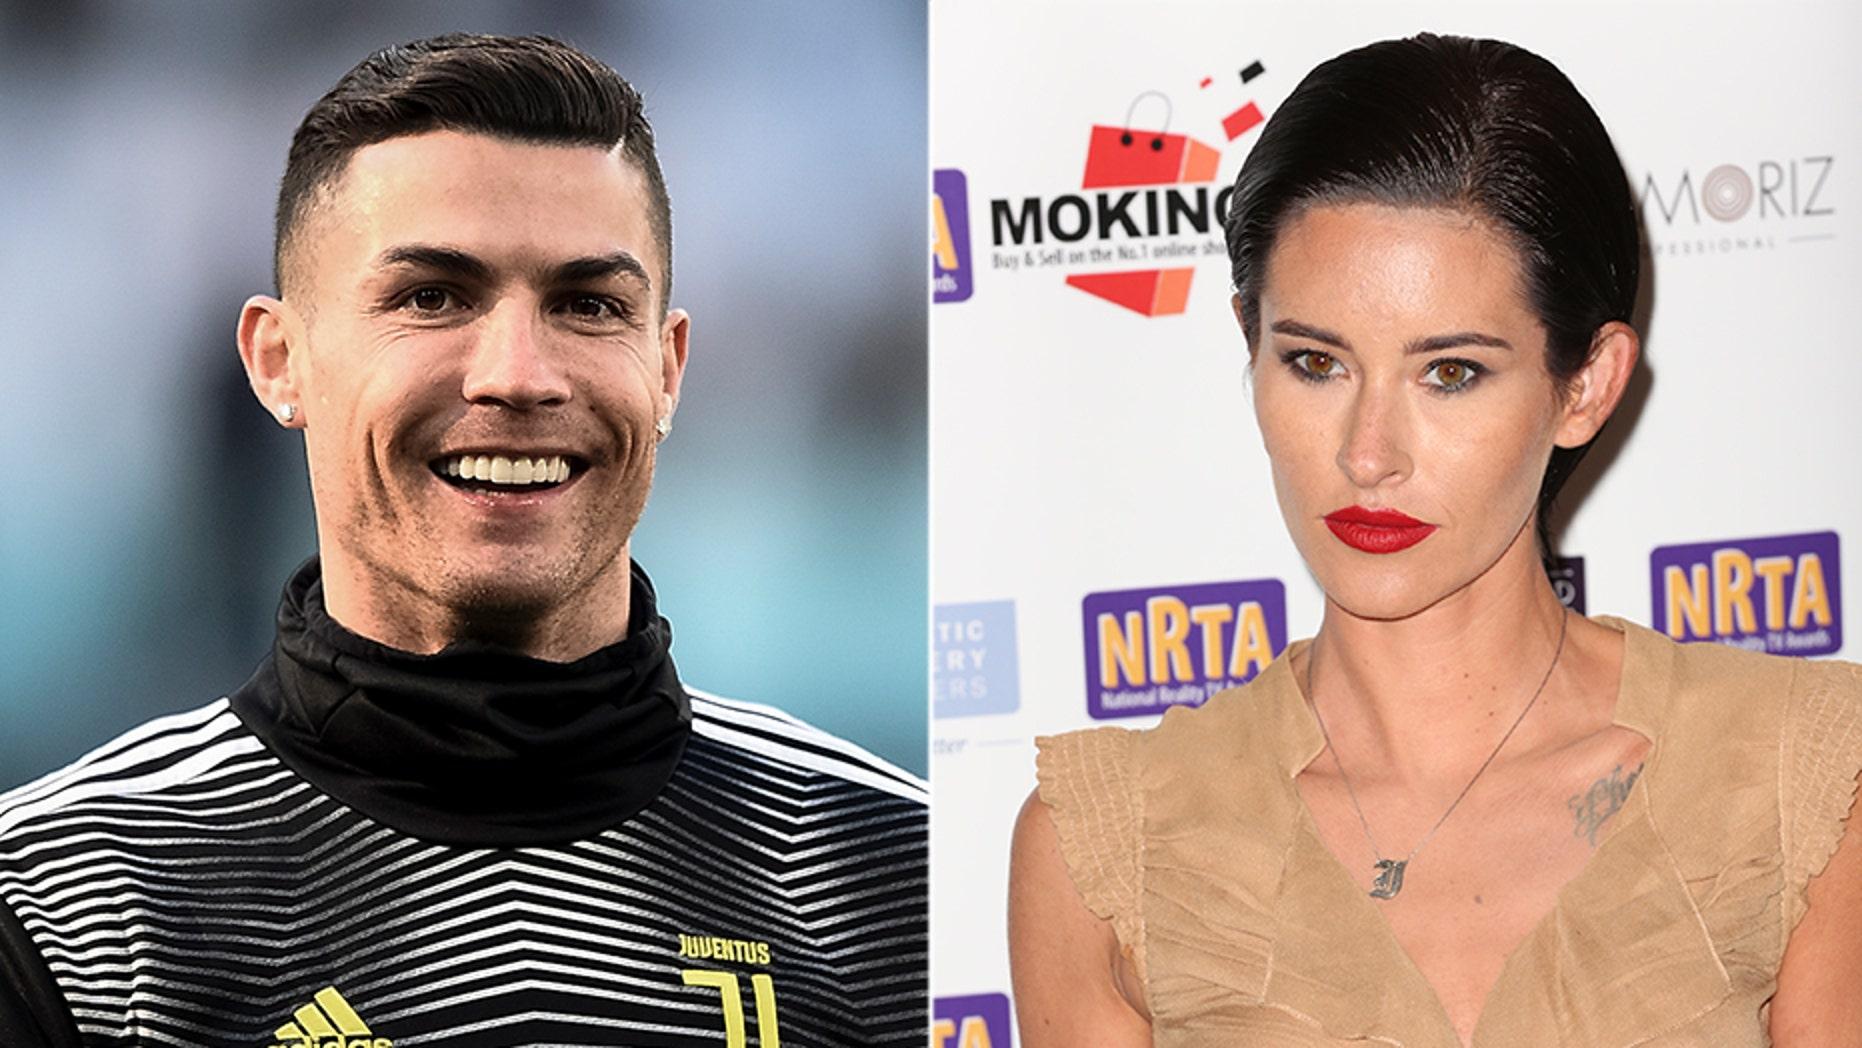 Jasmine Lennard, right, claimed Juventus soccer star Cristiano Ronaldo threatened her with bodily harm.